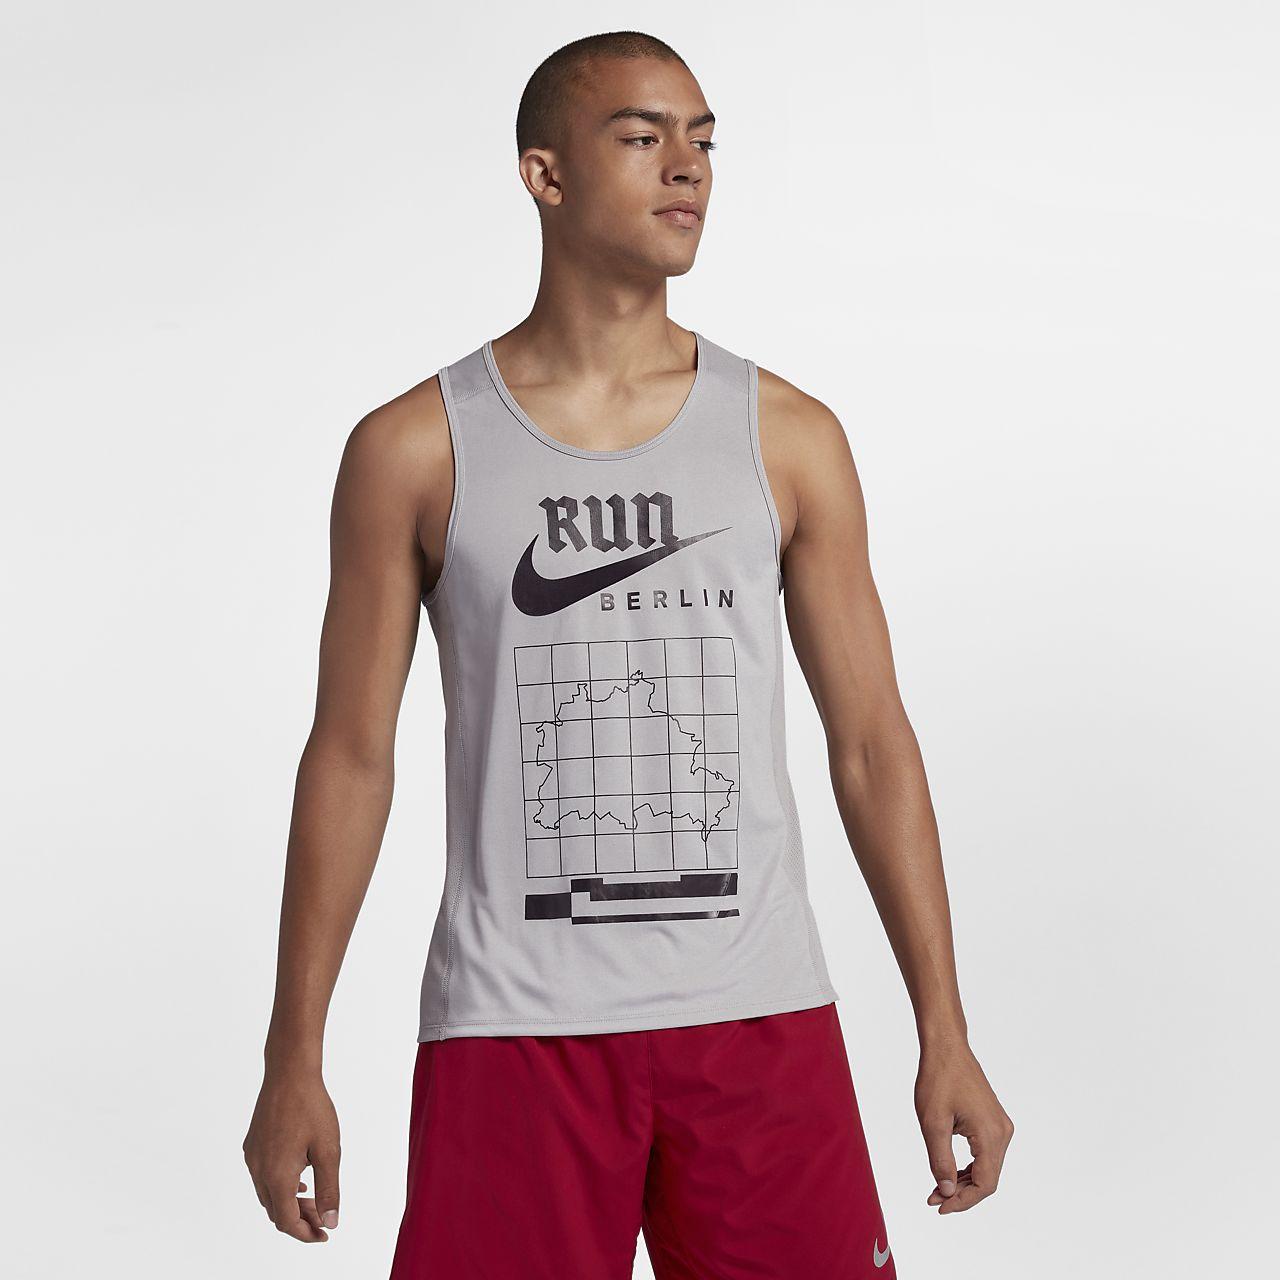 6c80e6f2413501 Nike Miler (Berlin 2018) Men s Running Tank. Nike.com CA